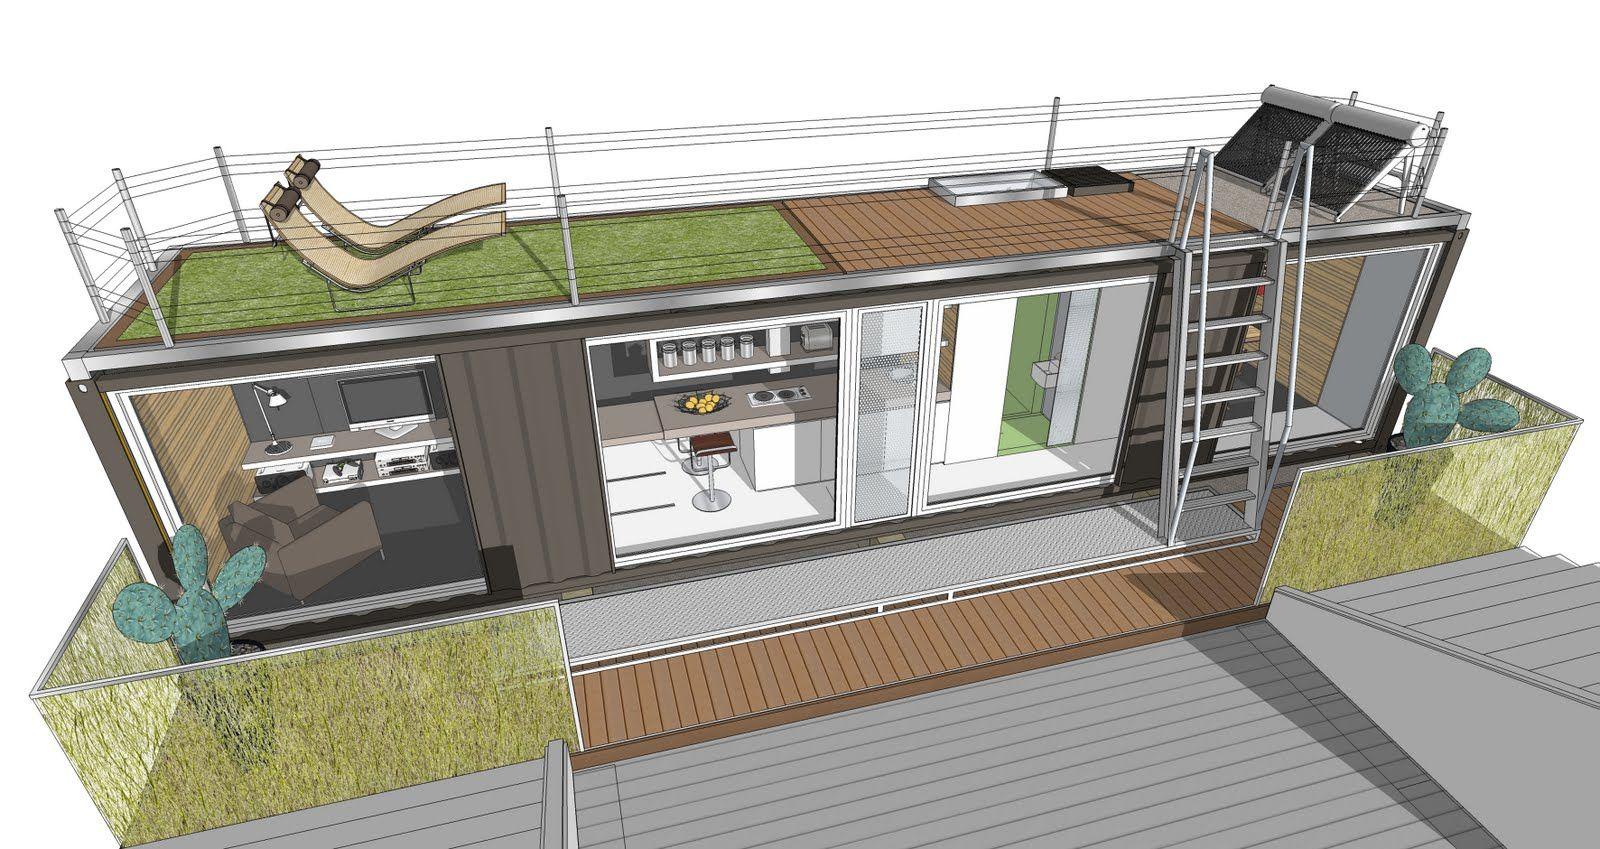 arquitectos que hicieron casas en terralagos - Buscar con Google ...